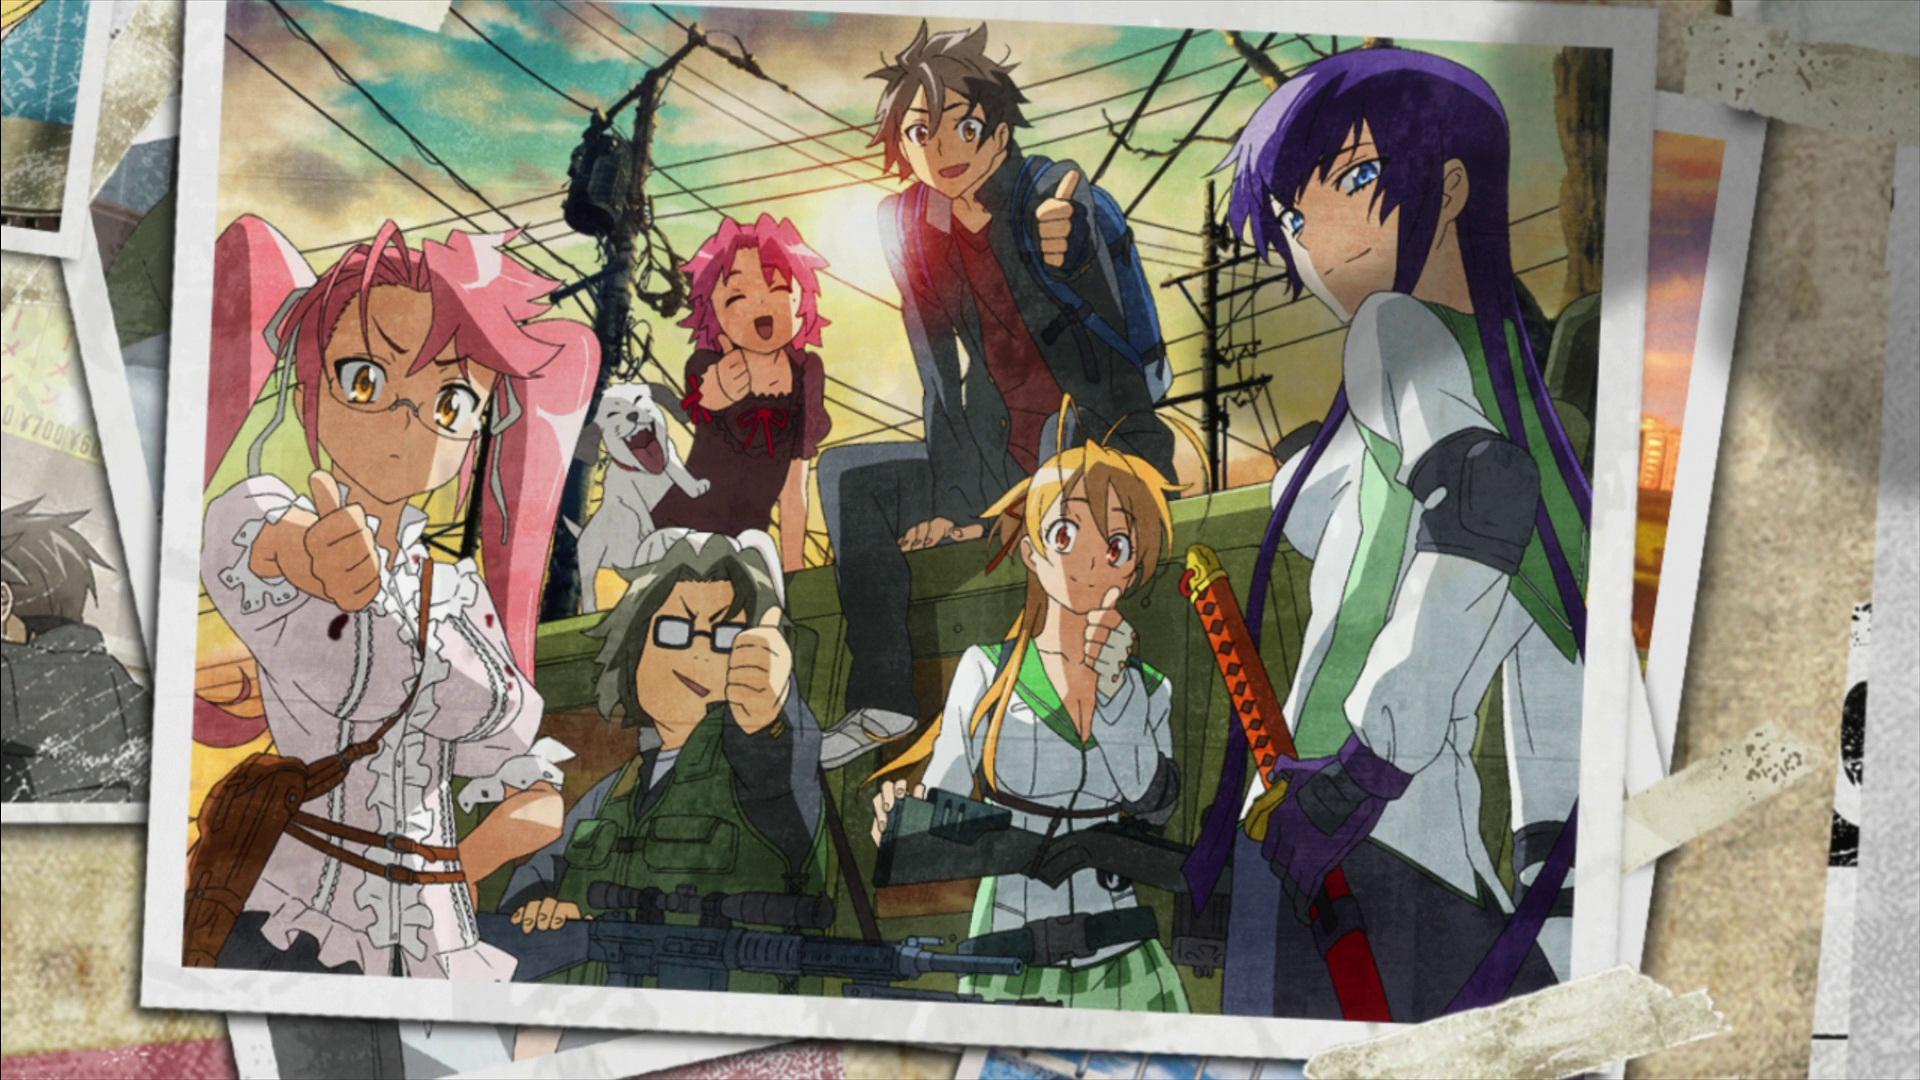 Anime Zombie Characters : Highschool of the dead computer wallpapers desktop